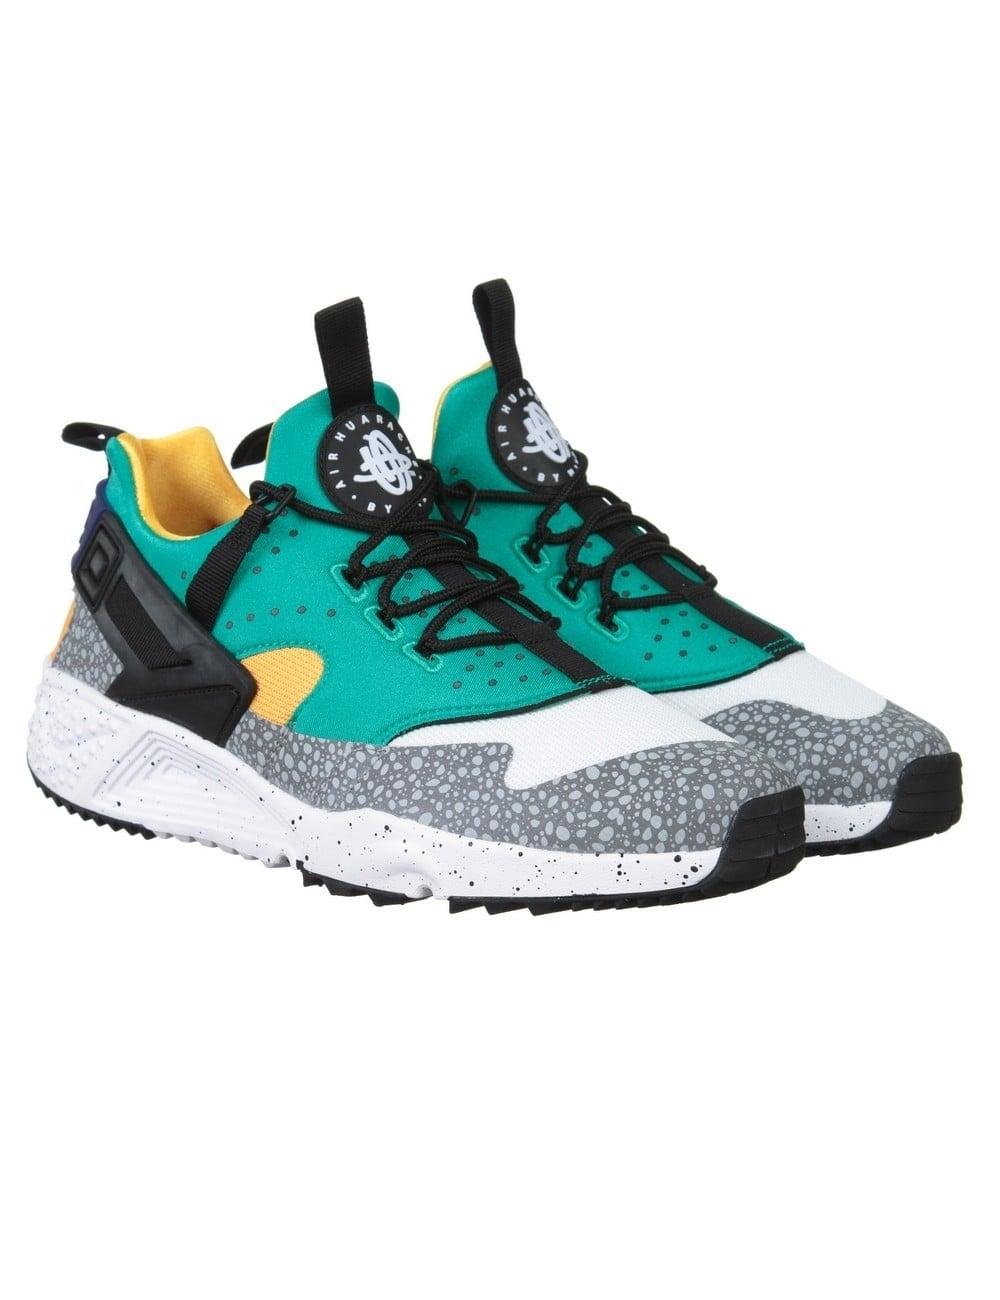 Nike Air Huarache Utility Shoes - White Black Emerald Green ... 7aff316907